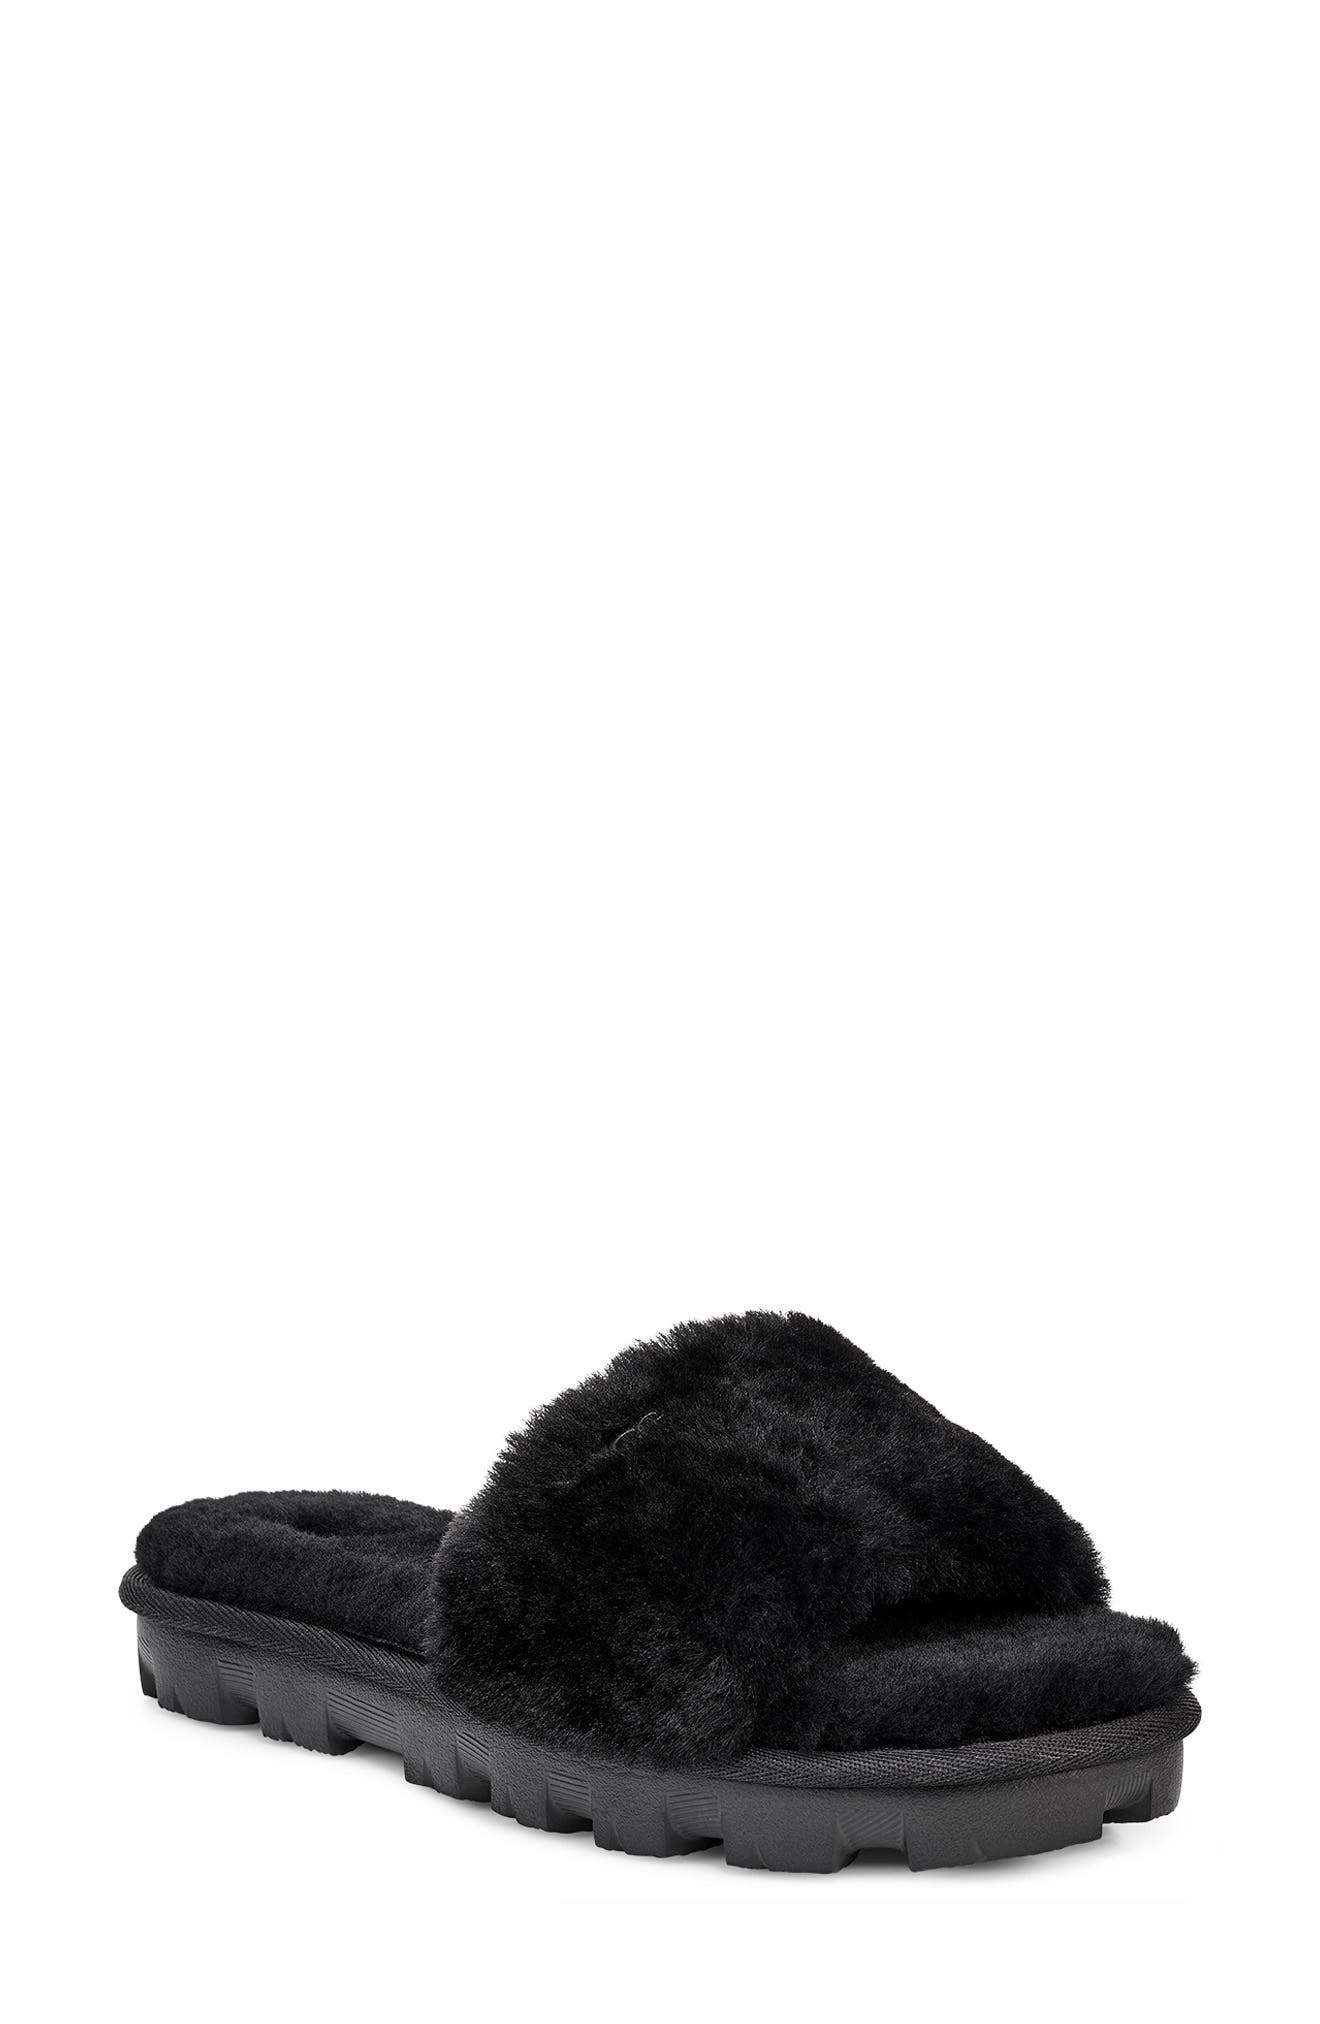 Ugg Cozette Genuine Shearling Slipper, Black